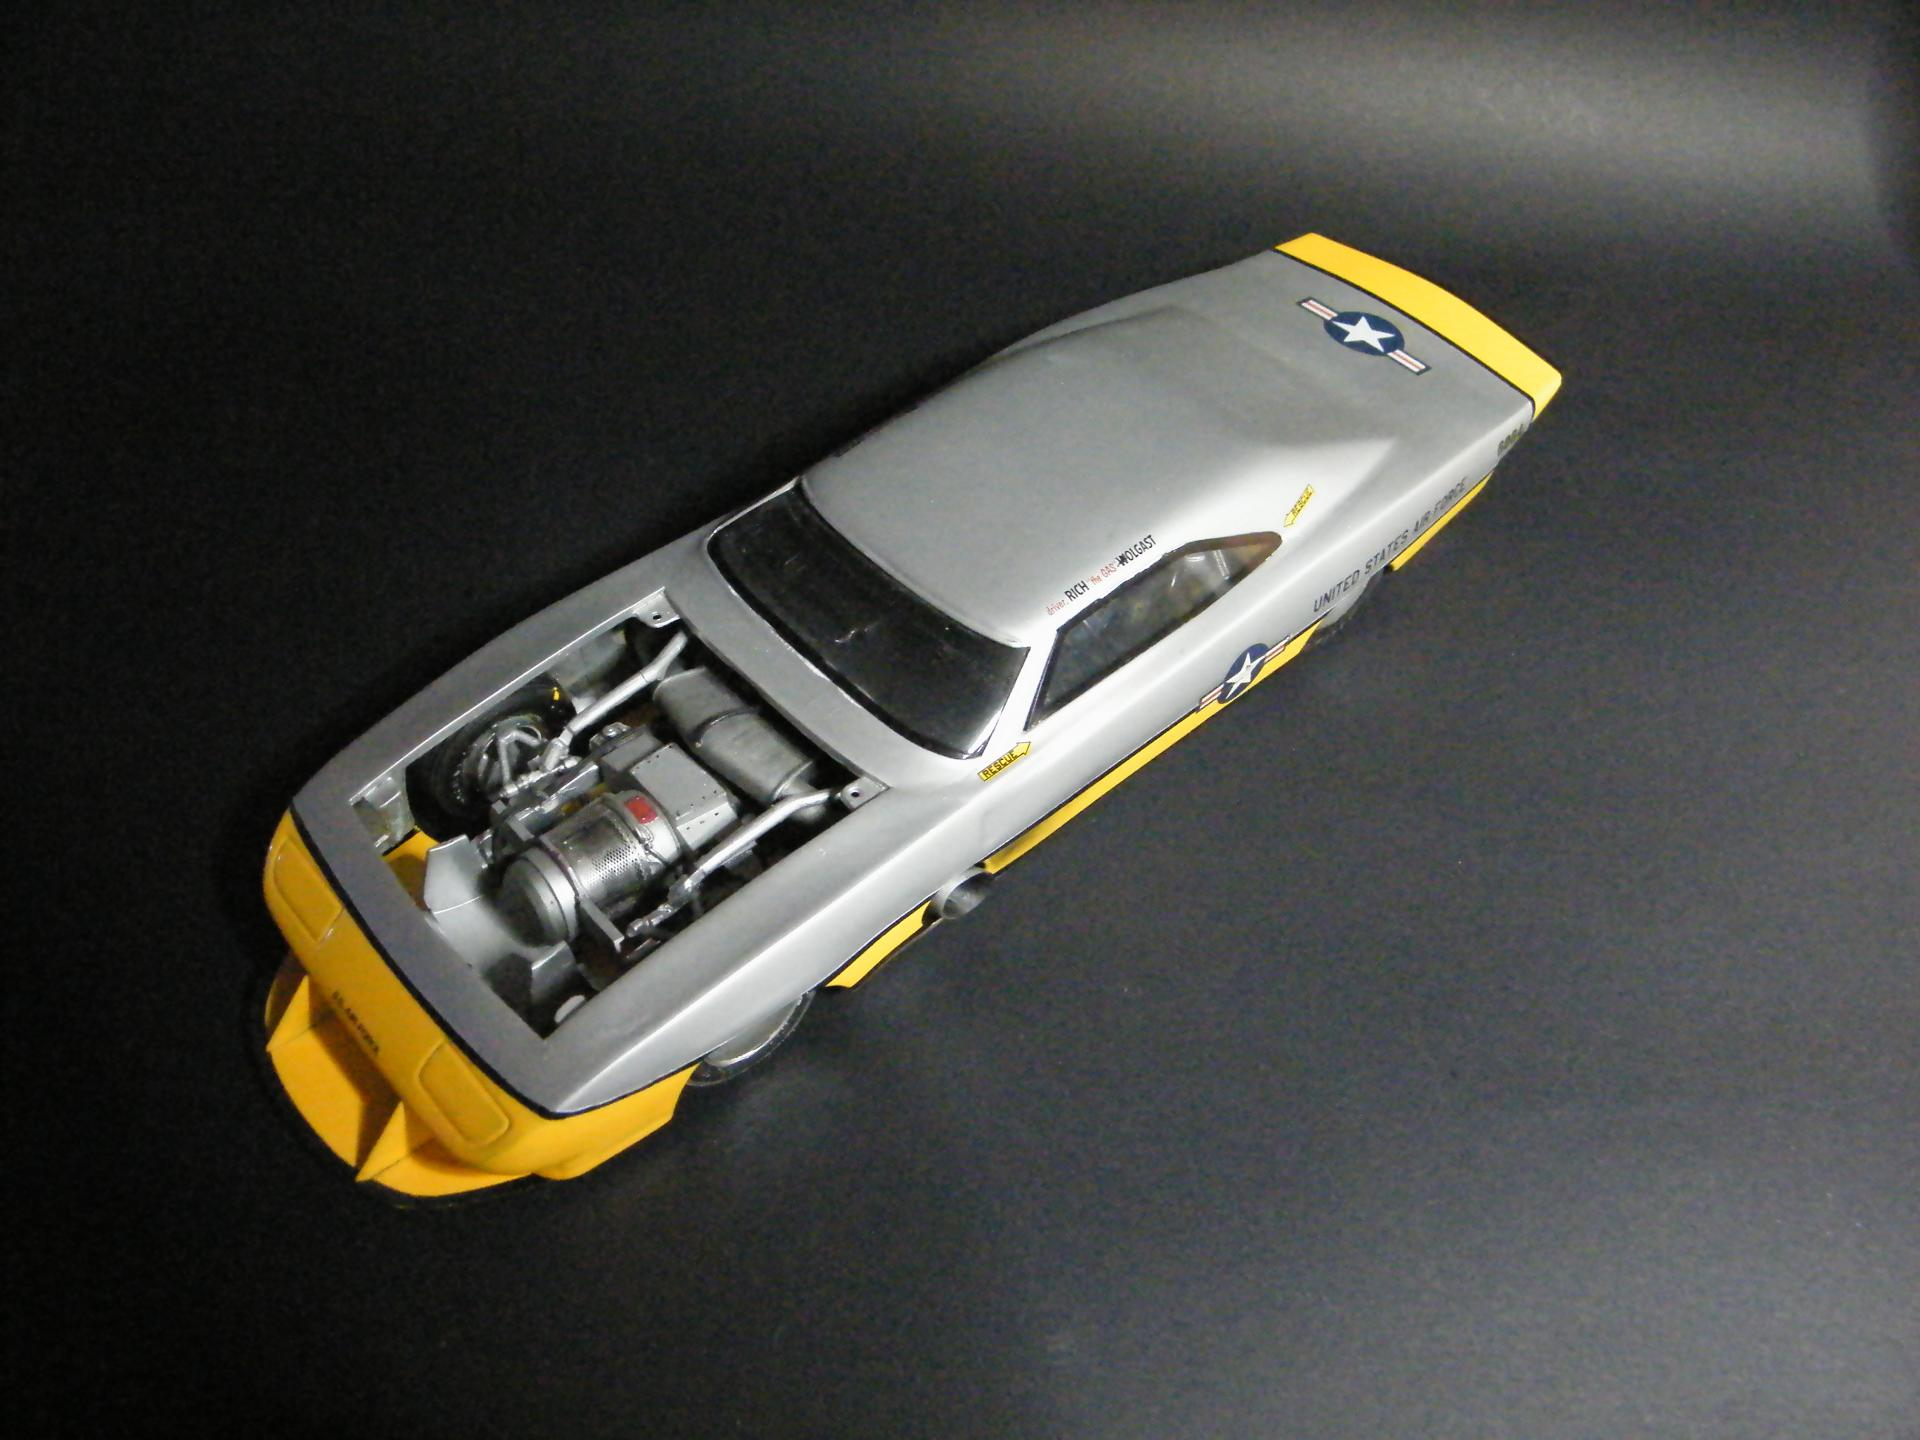 DSCF4547.thumb.JPG.3ec647c20375d33f0232d4be200e7d60.JPG